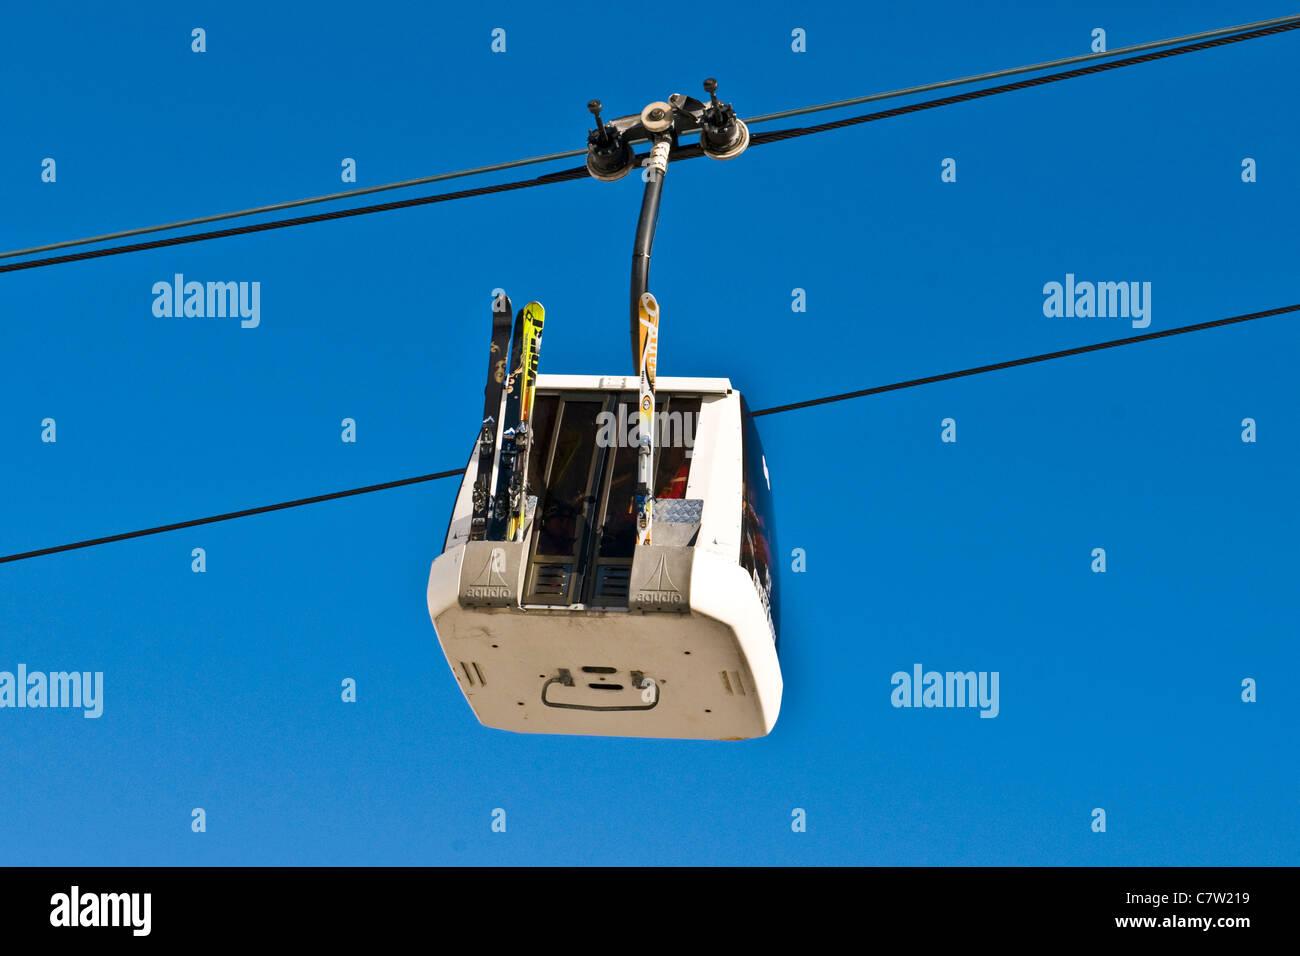 Italy, Aosta Valley,Gressoney-la-Trinite, cableway - Stock Image